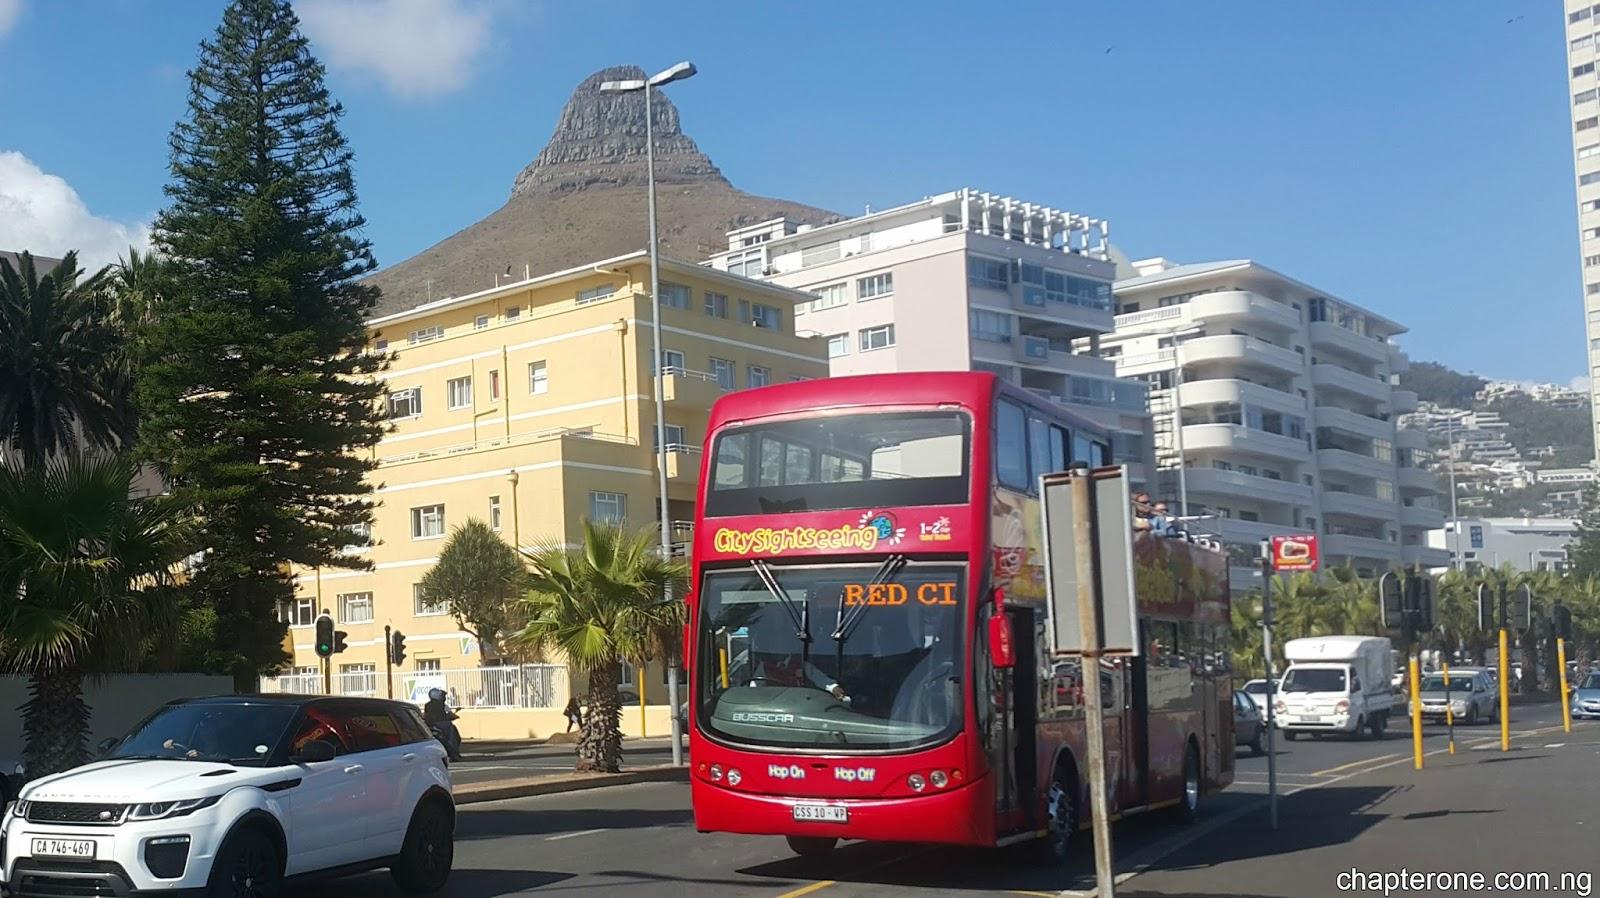 Cape Town Citysightseeing Bus